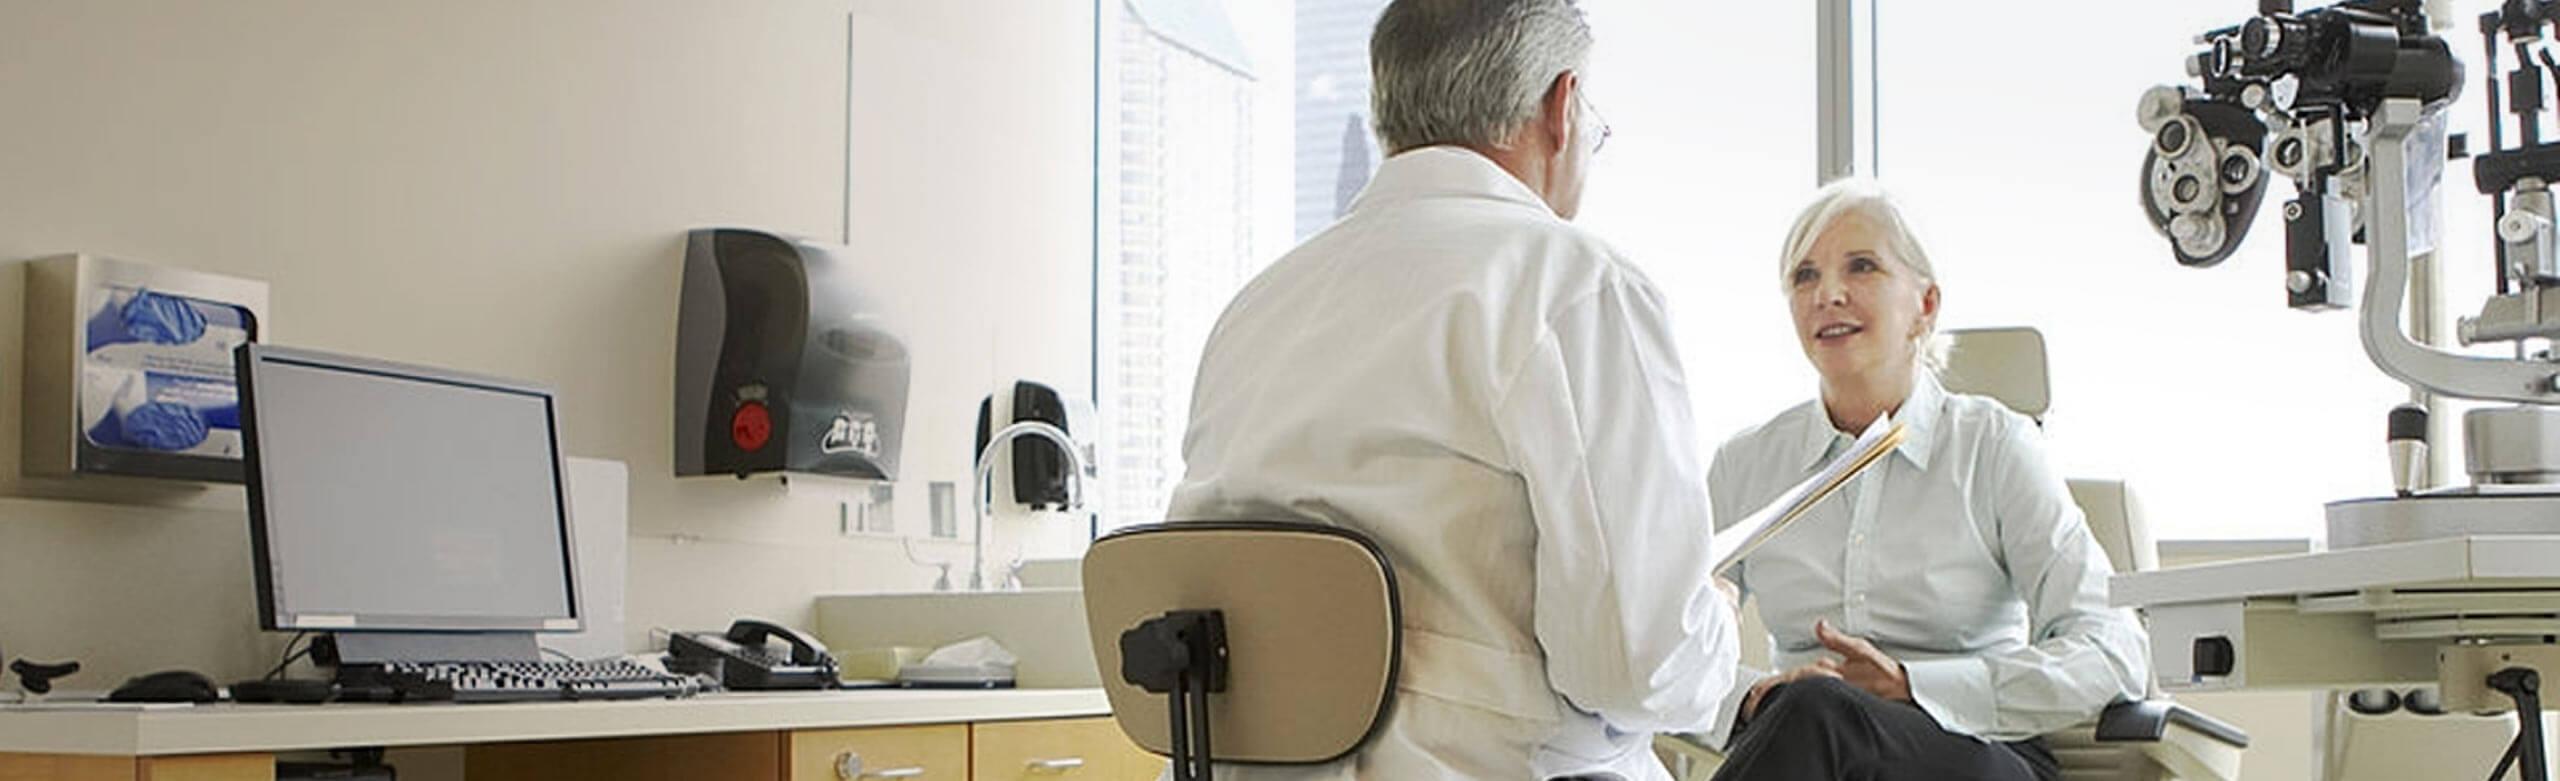 Oftalmologista e paciente conversando na sala de exames